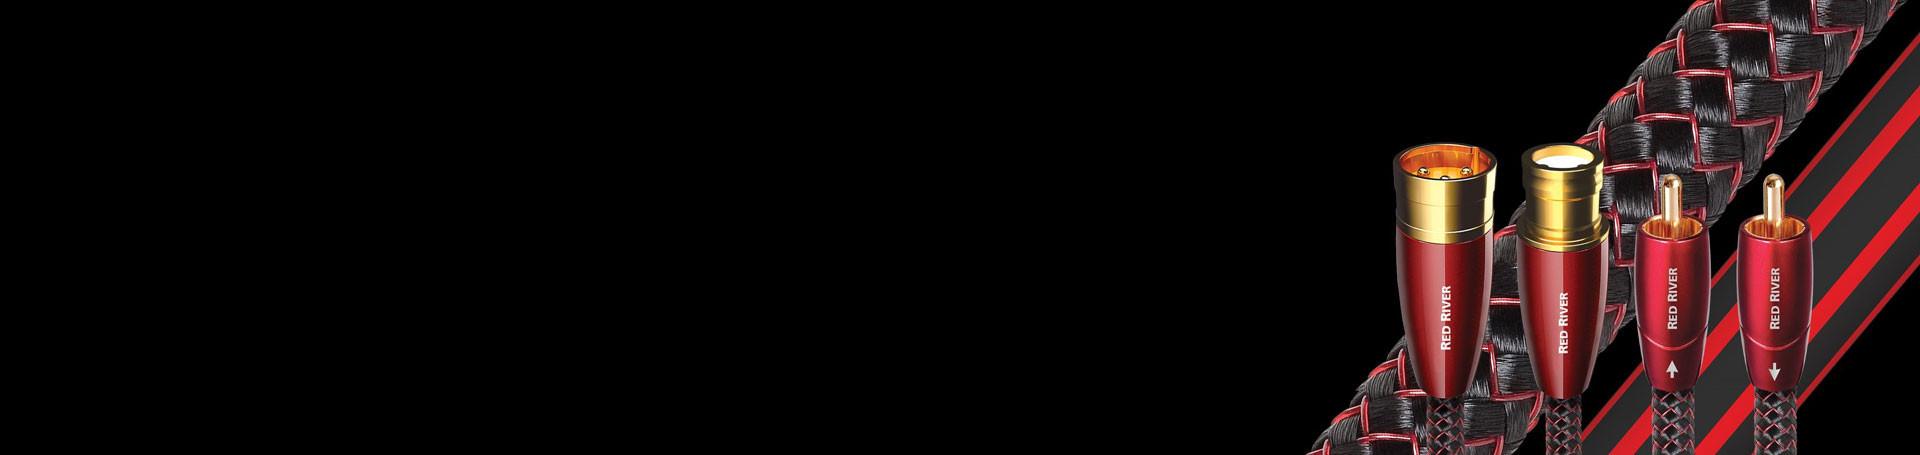 Câbles de modulation XLR